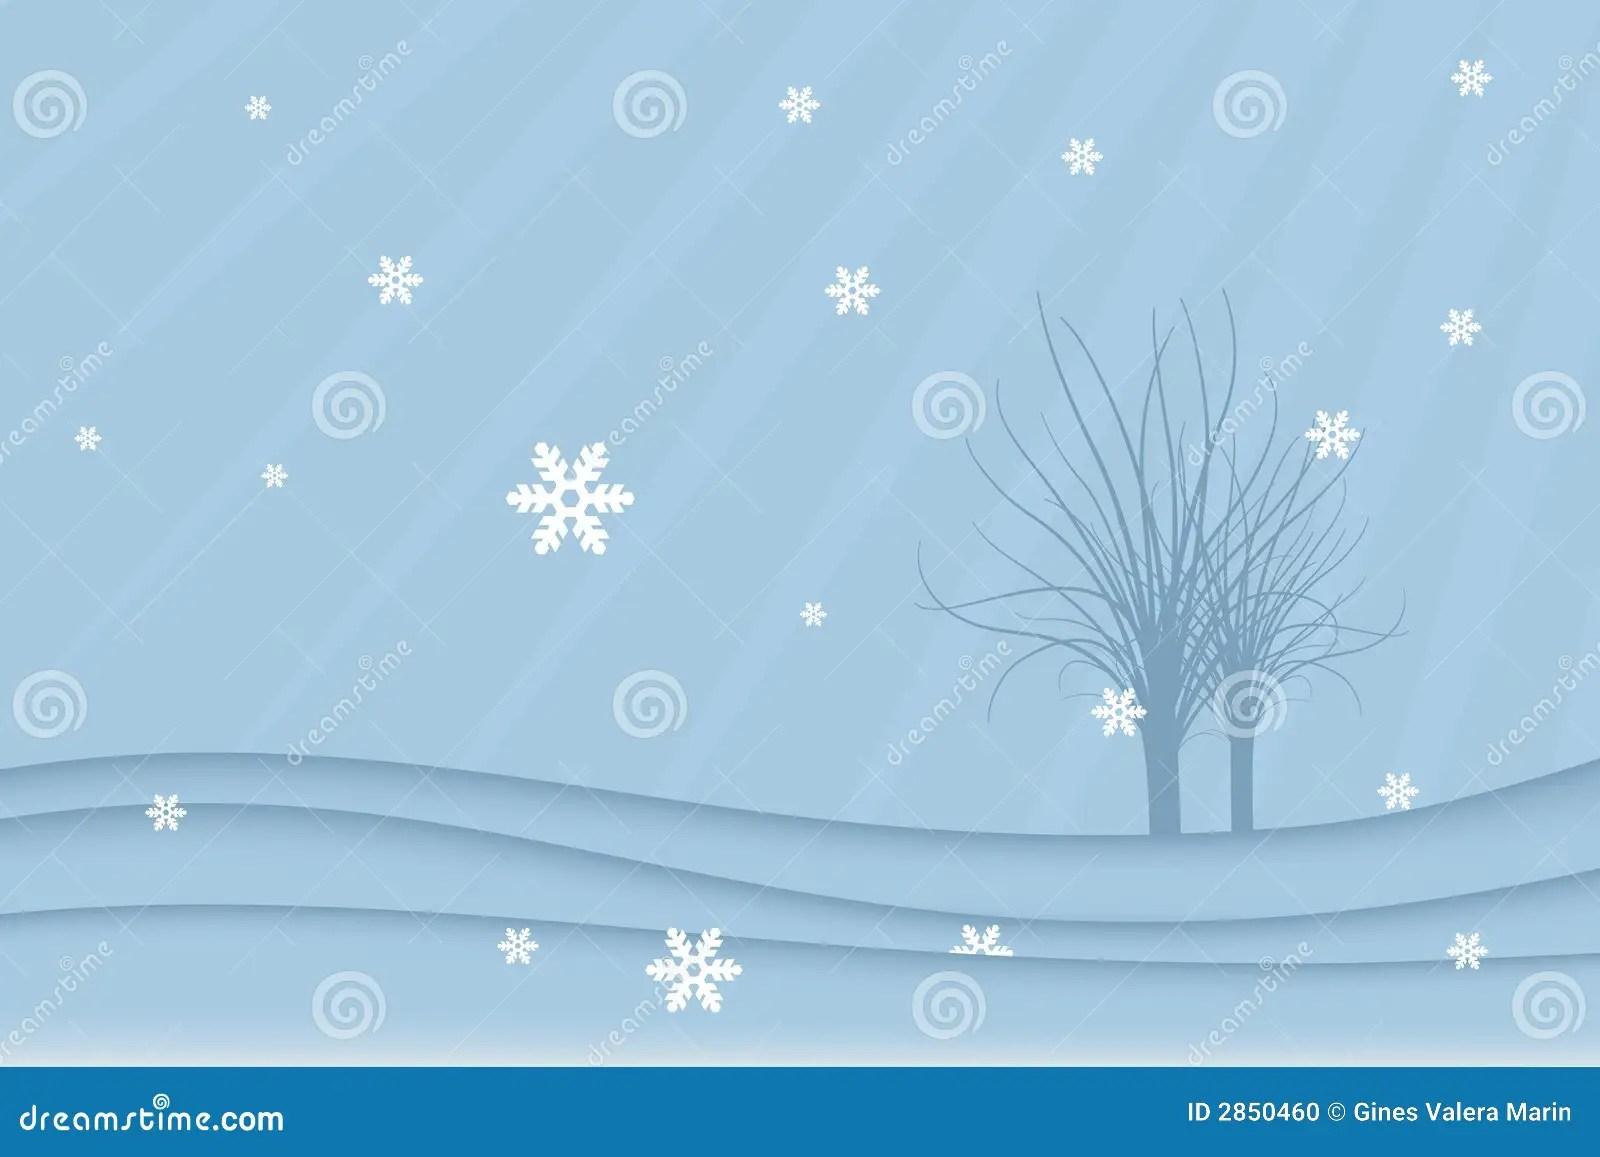 Winter Landscape Vector Stock Vector Illustration Of